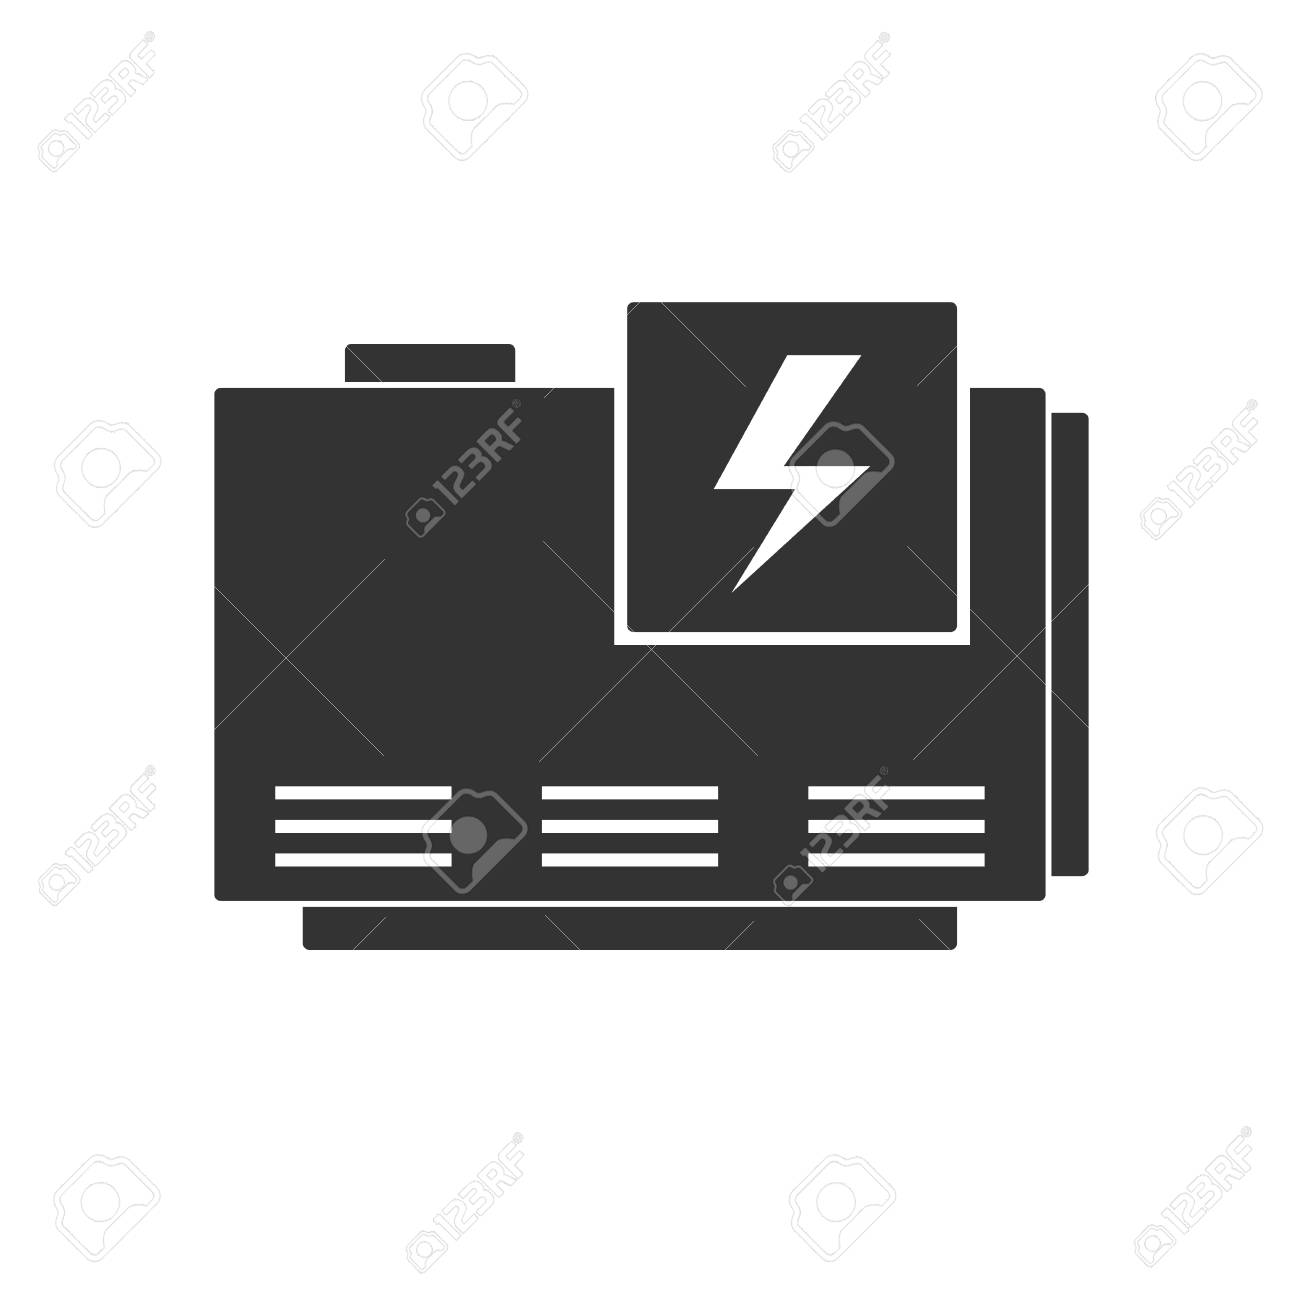 Elecrtic home generator - 97638547